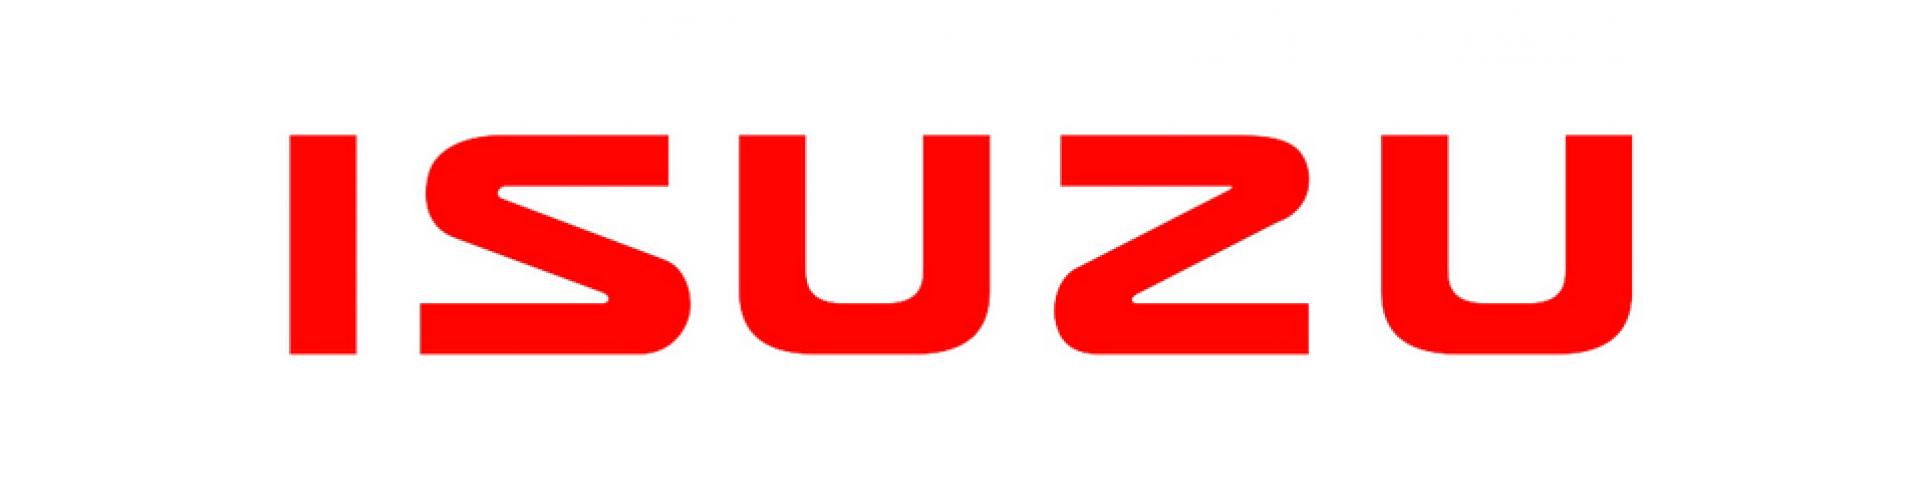 Isuzu Fitting Jvc Wiring Harness Nz Product Compare 0